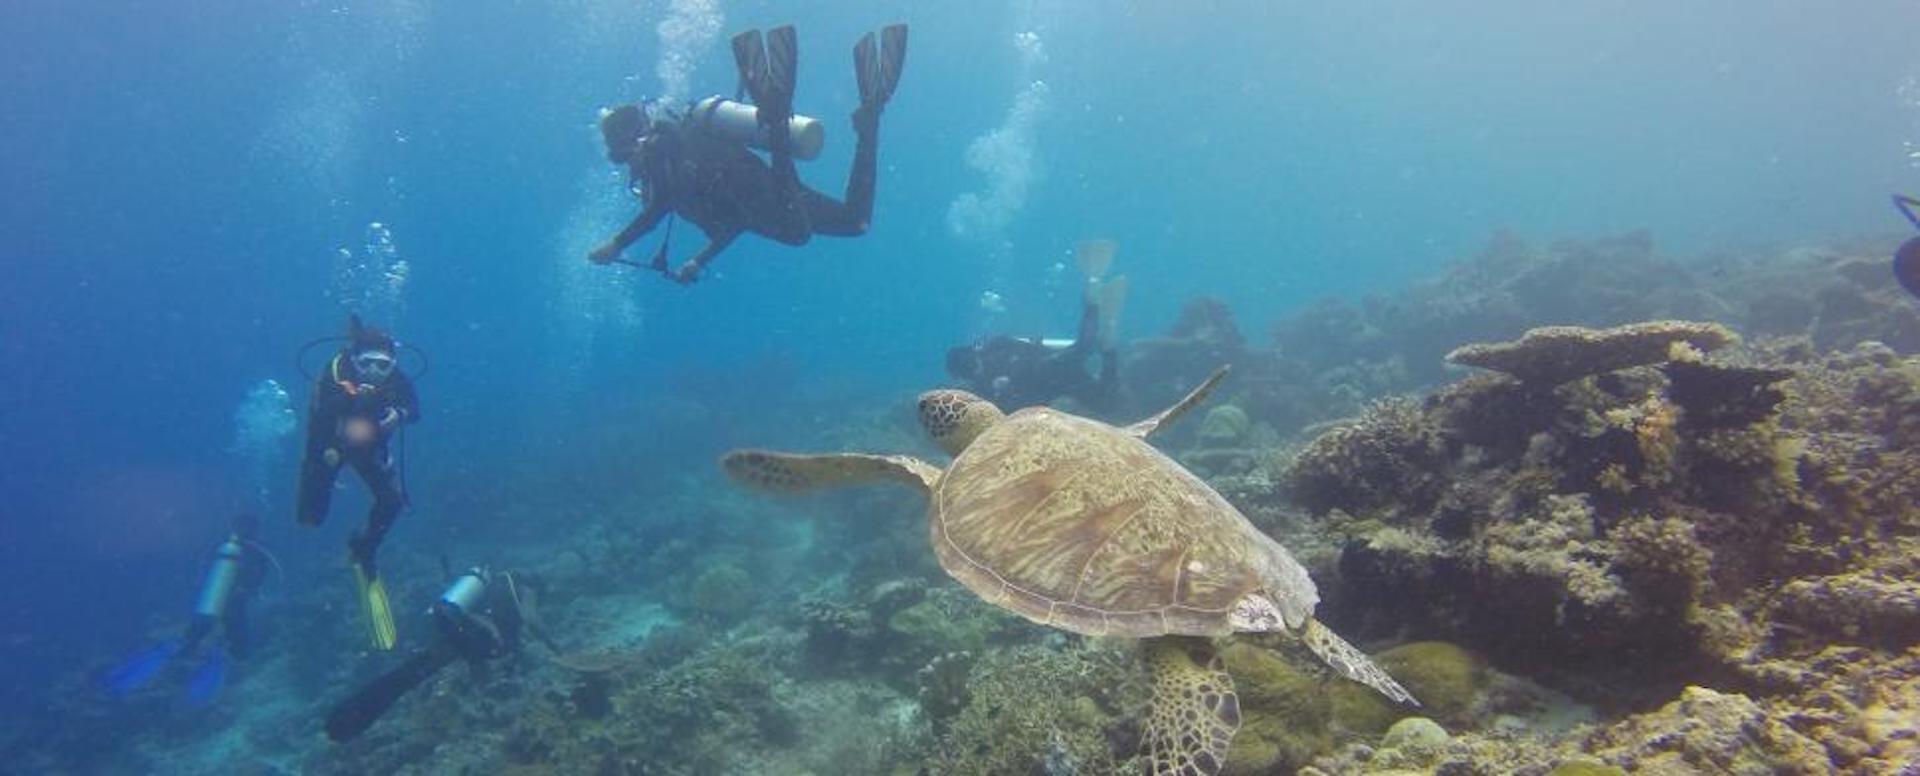 Indulge in water sports - Indonesia